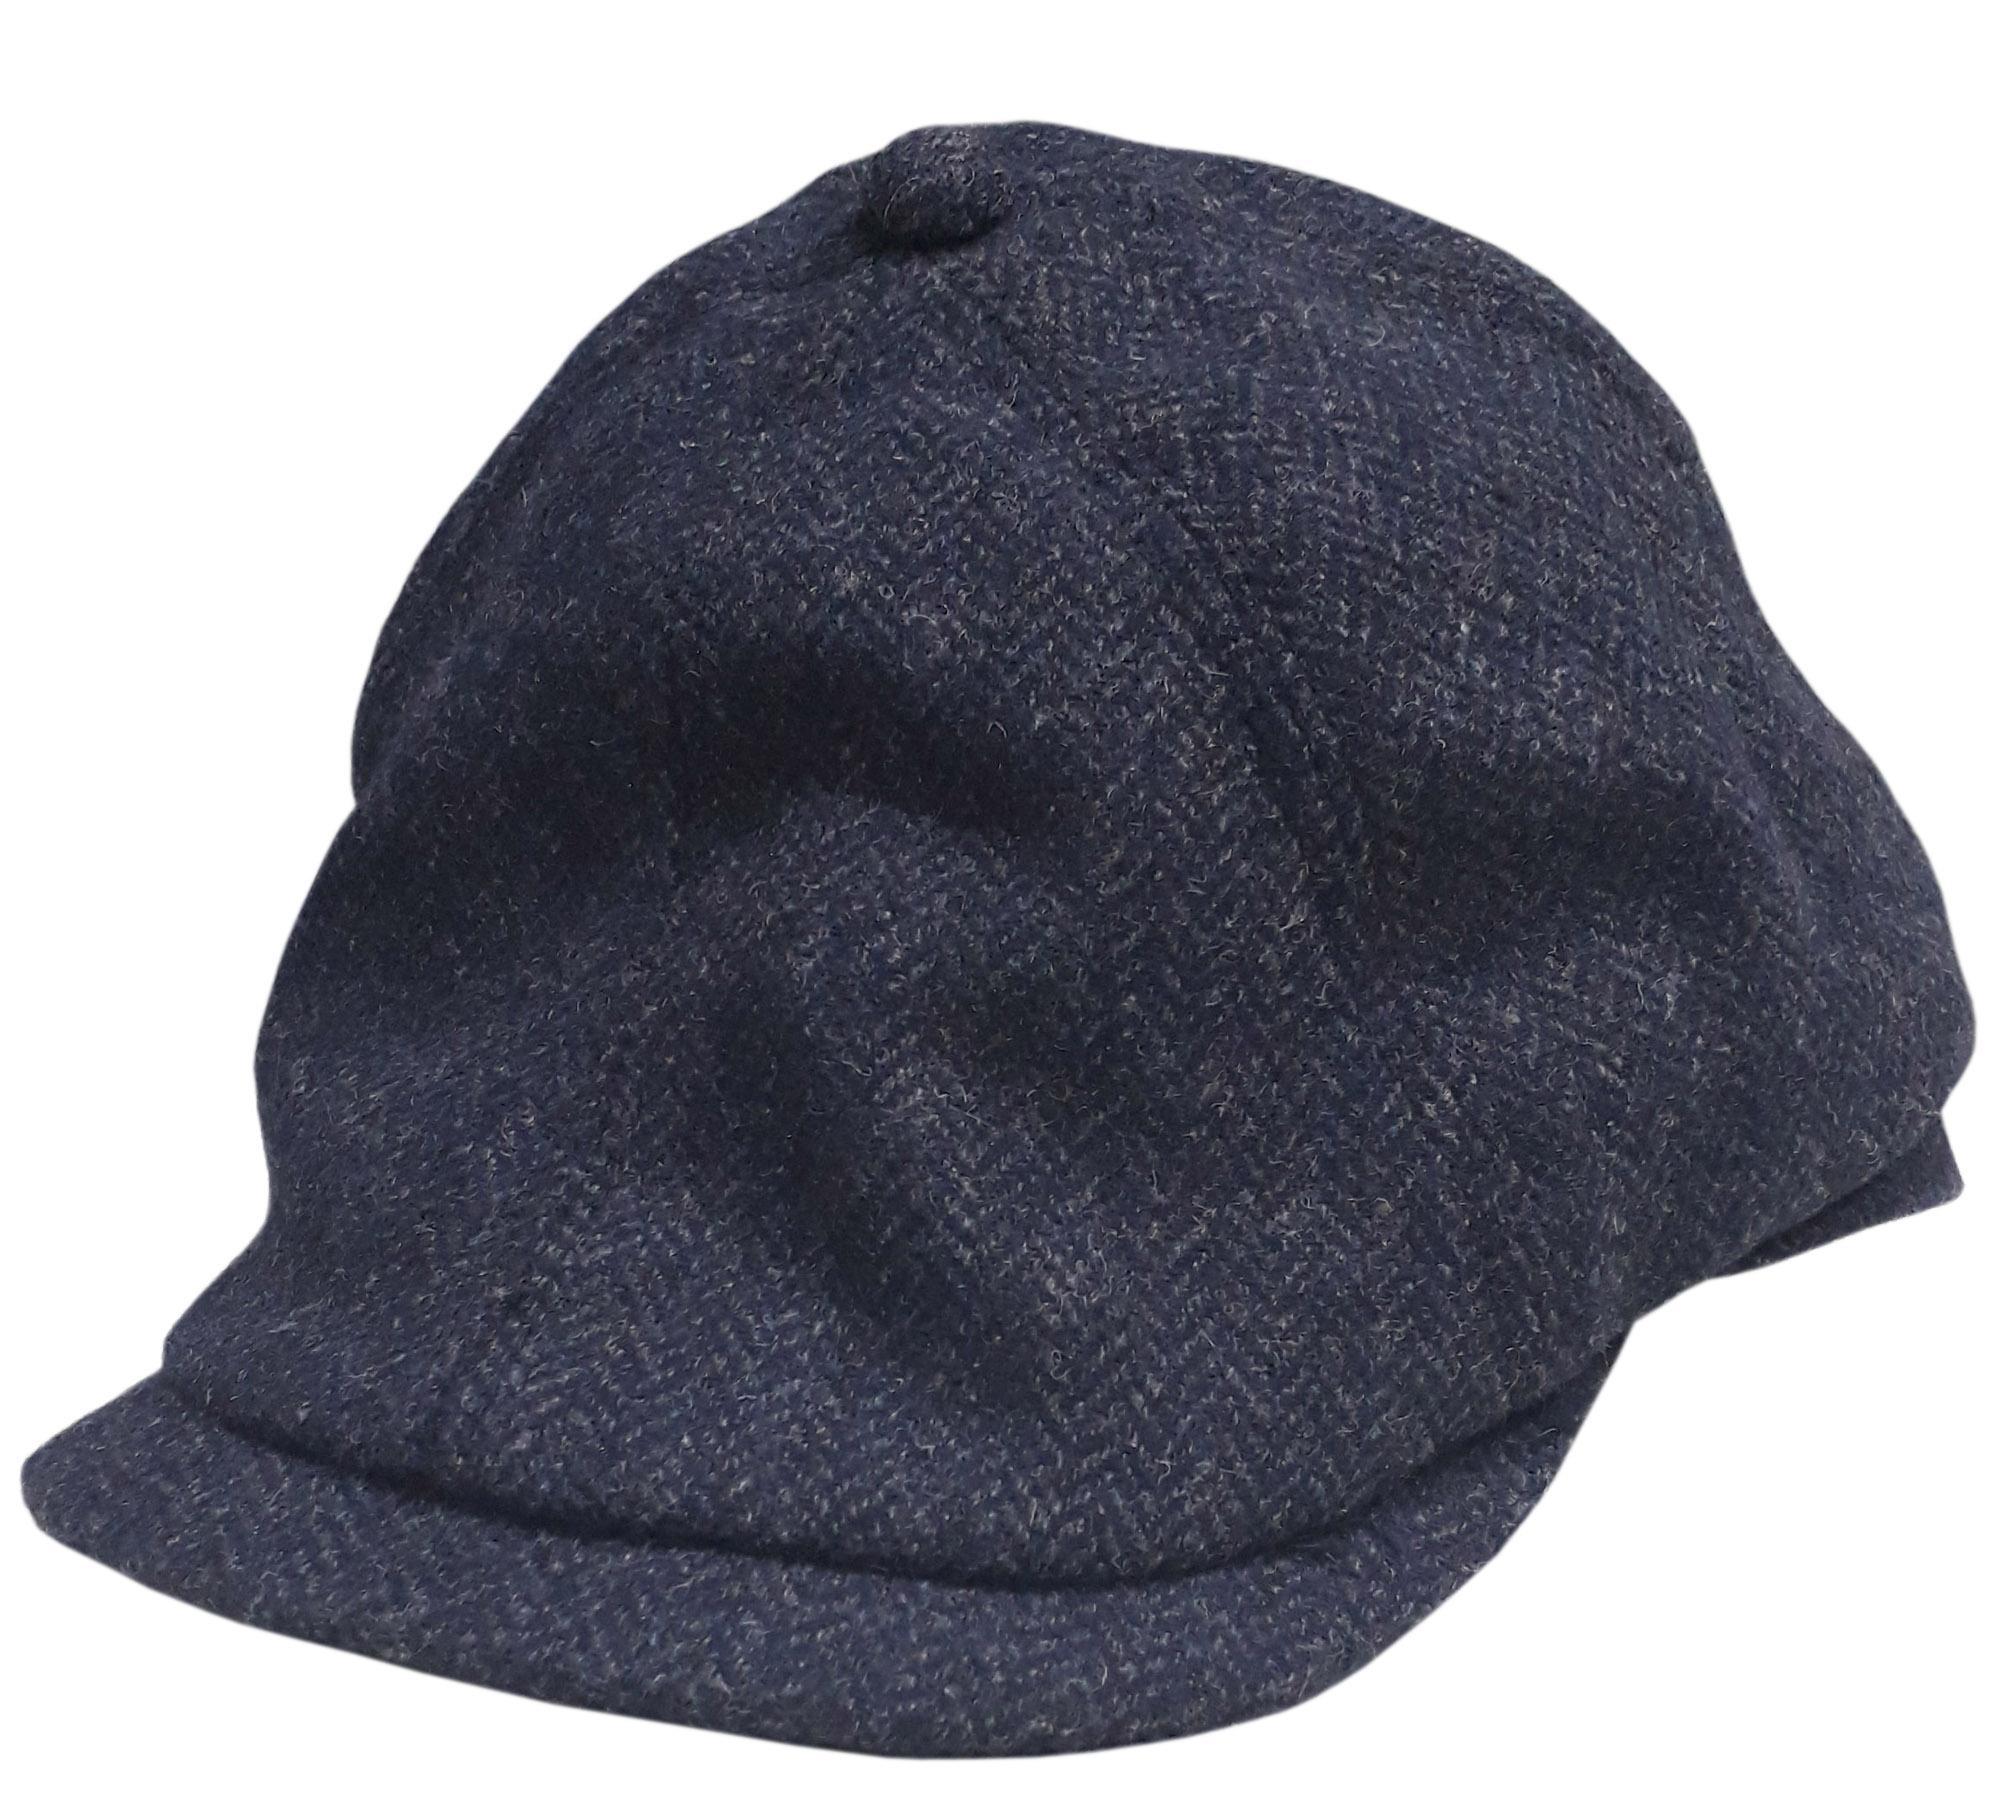 59605106cc0 Buy Mens Caps   Hats   Best Price in Pakistan - Daraz.pk